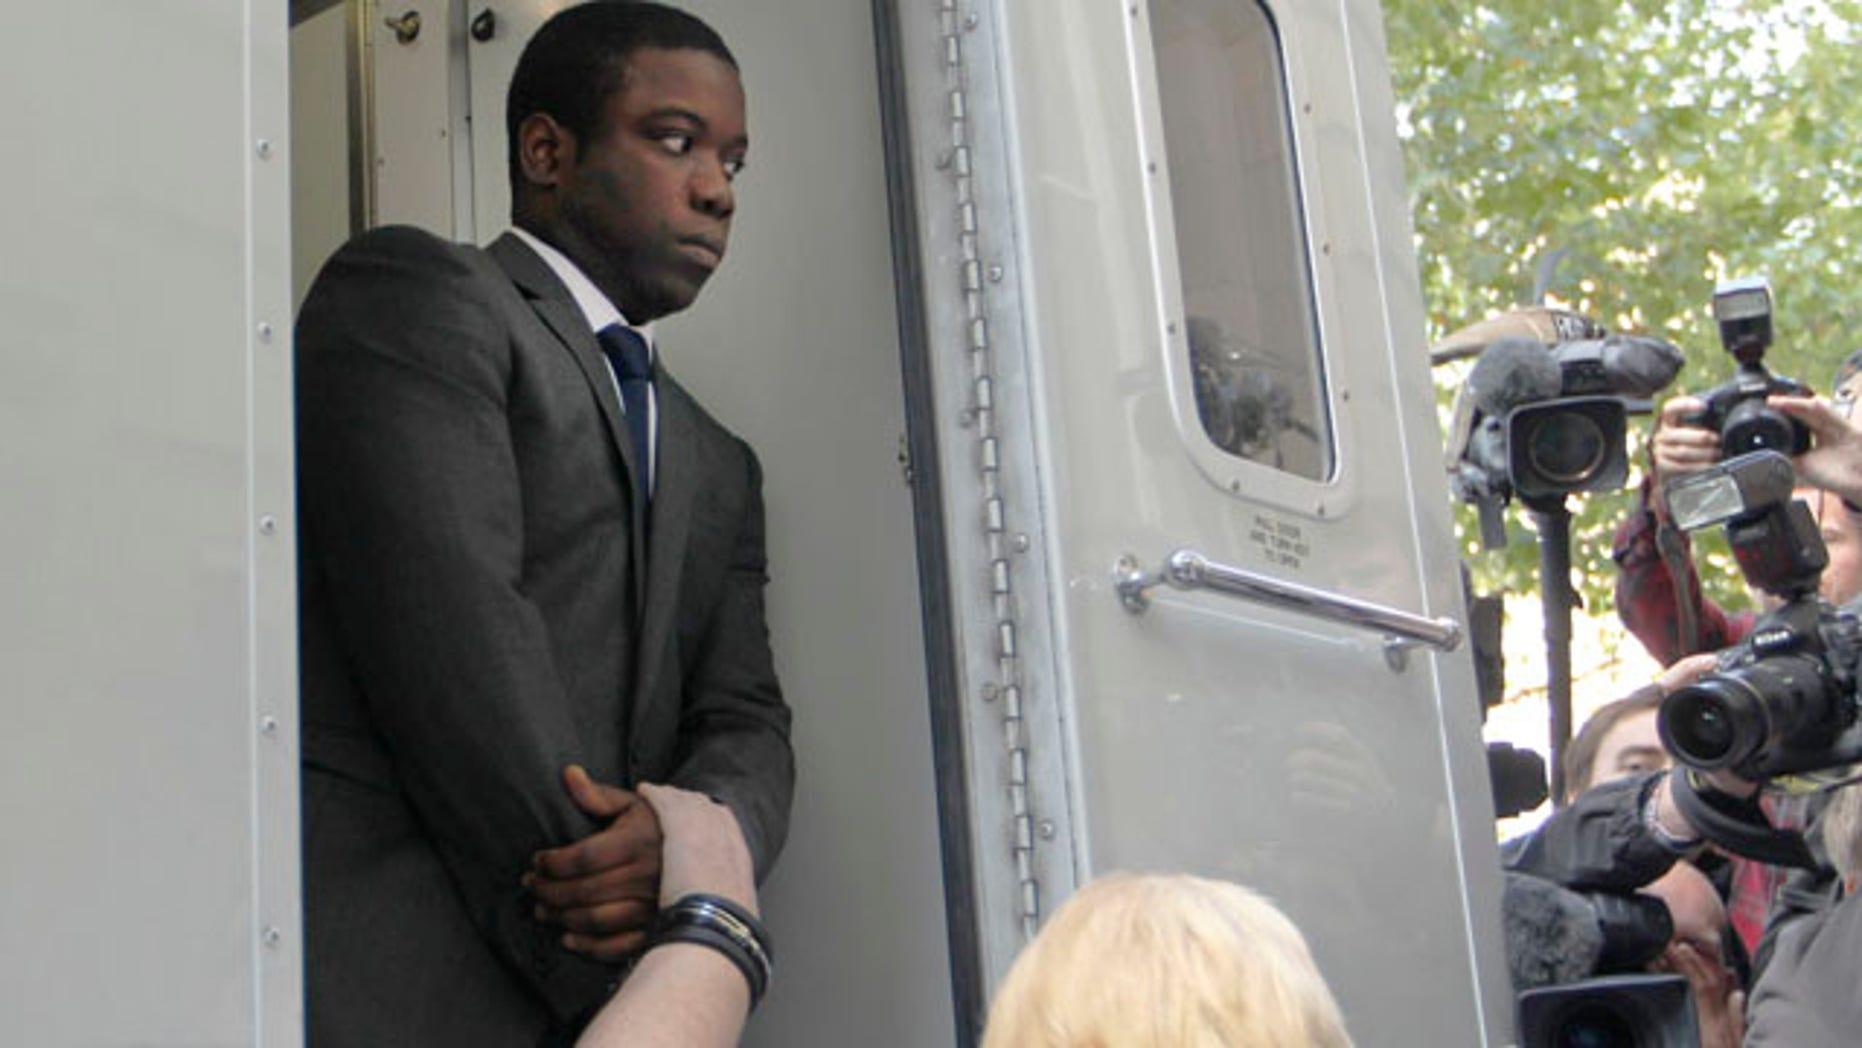 Sept. 22: Trader Kweku Adoboli arrivies at City of London Magistrates' Court in London.